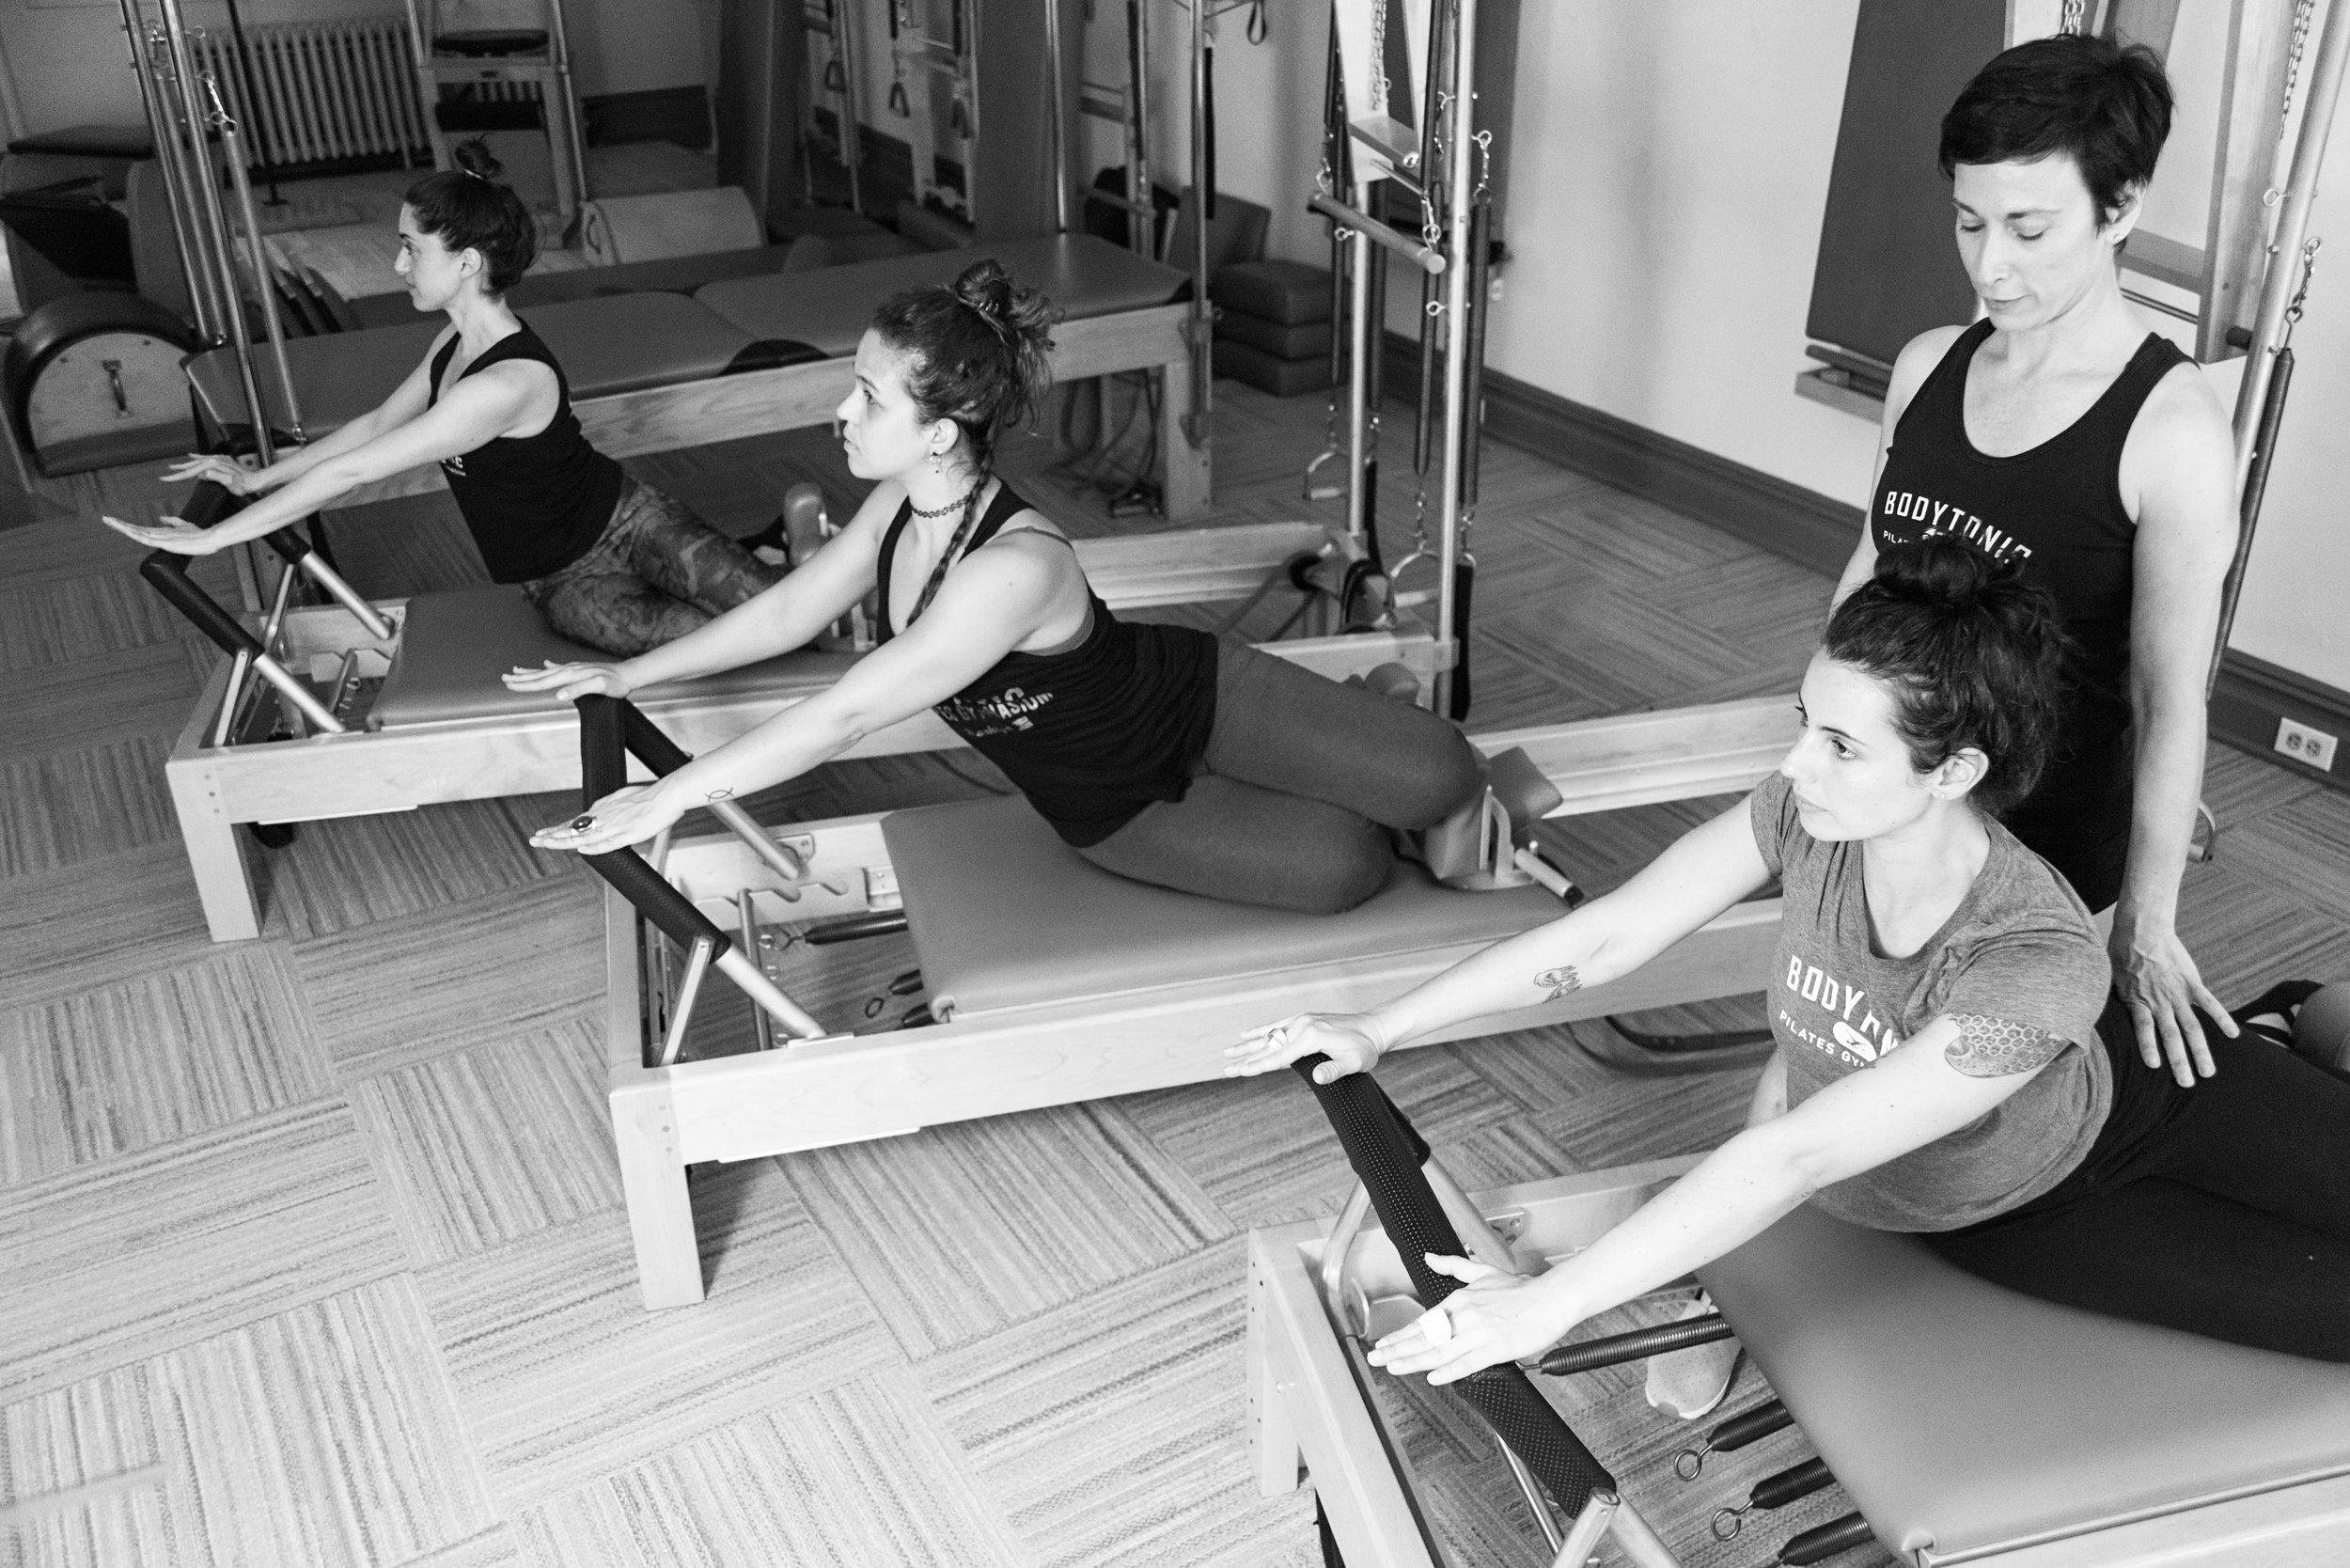 Semi Private Training at BodyTonic Pilates